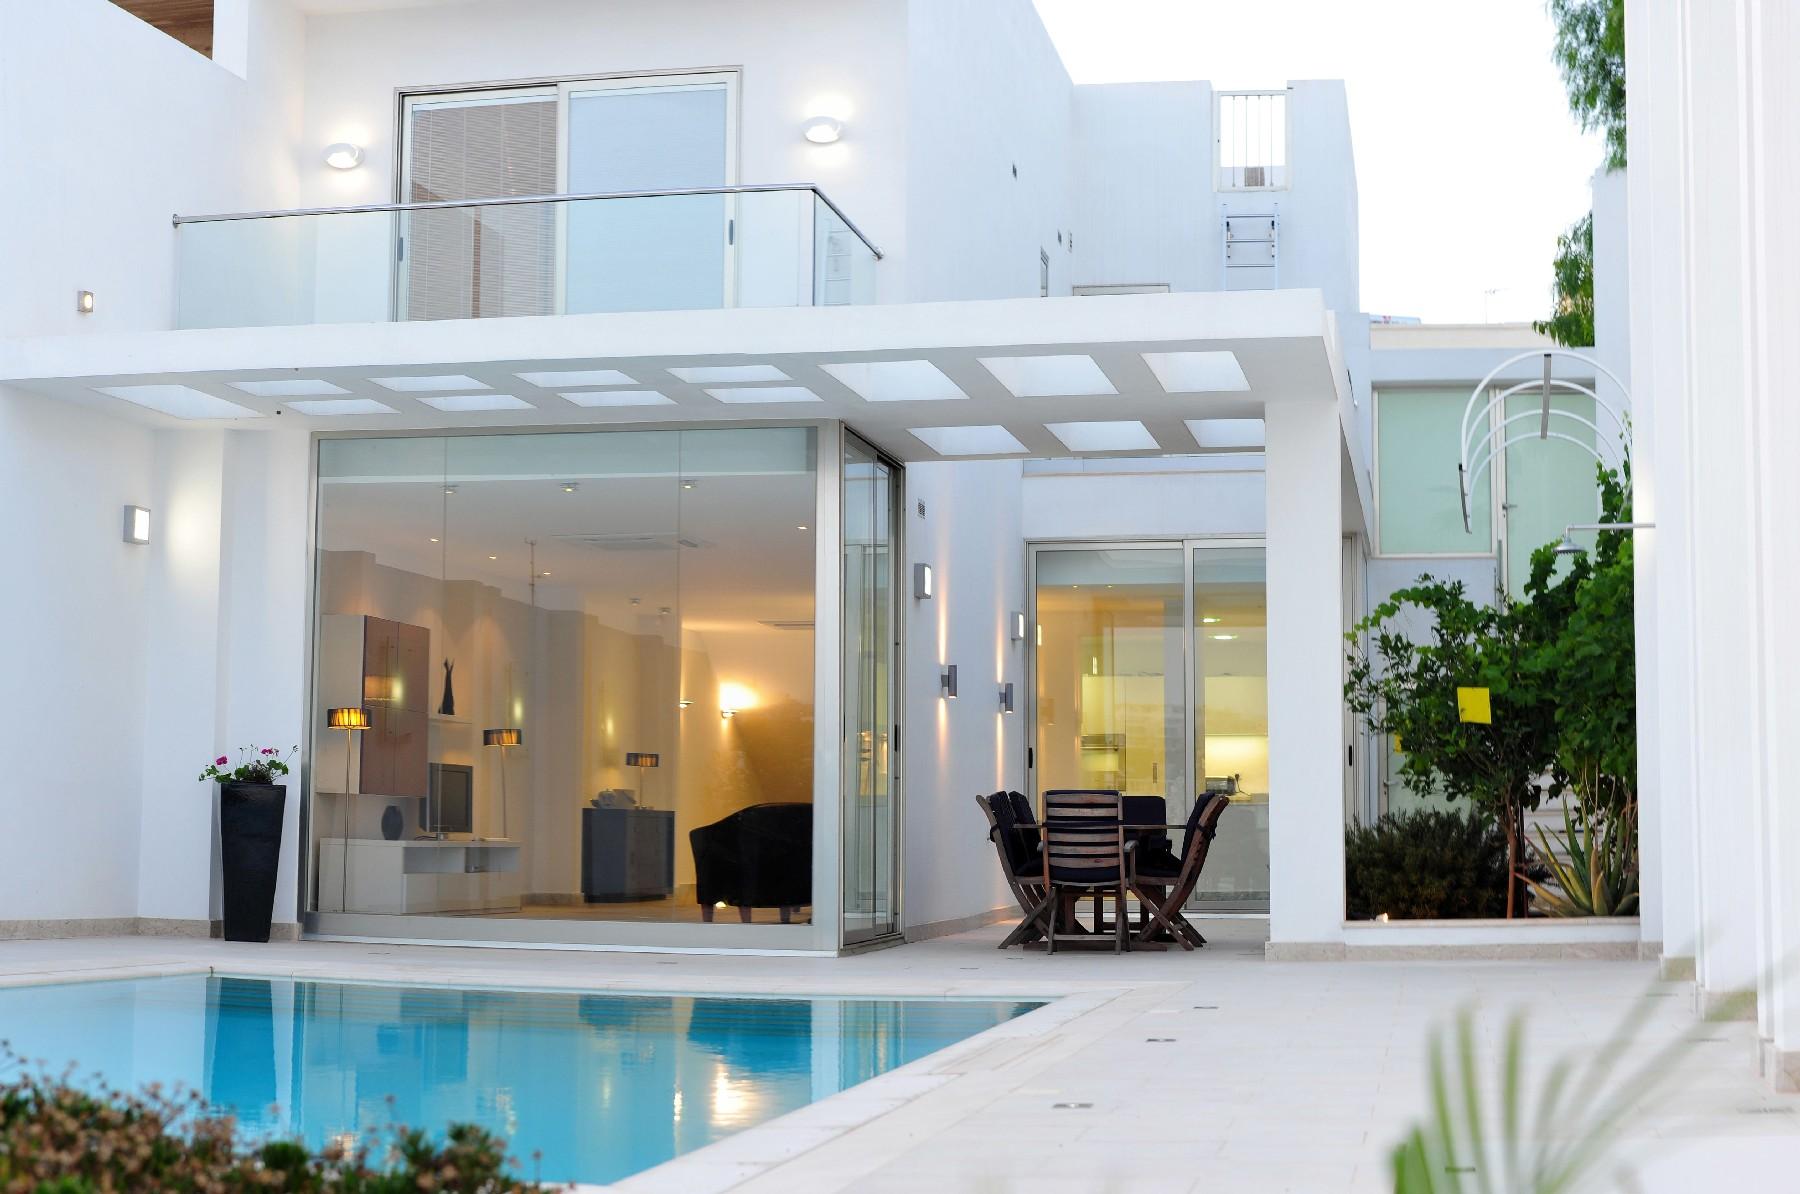 Malta Property for sale in Malta, Mellieha